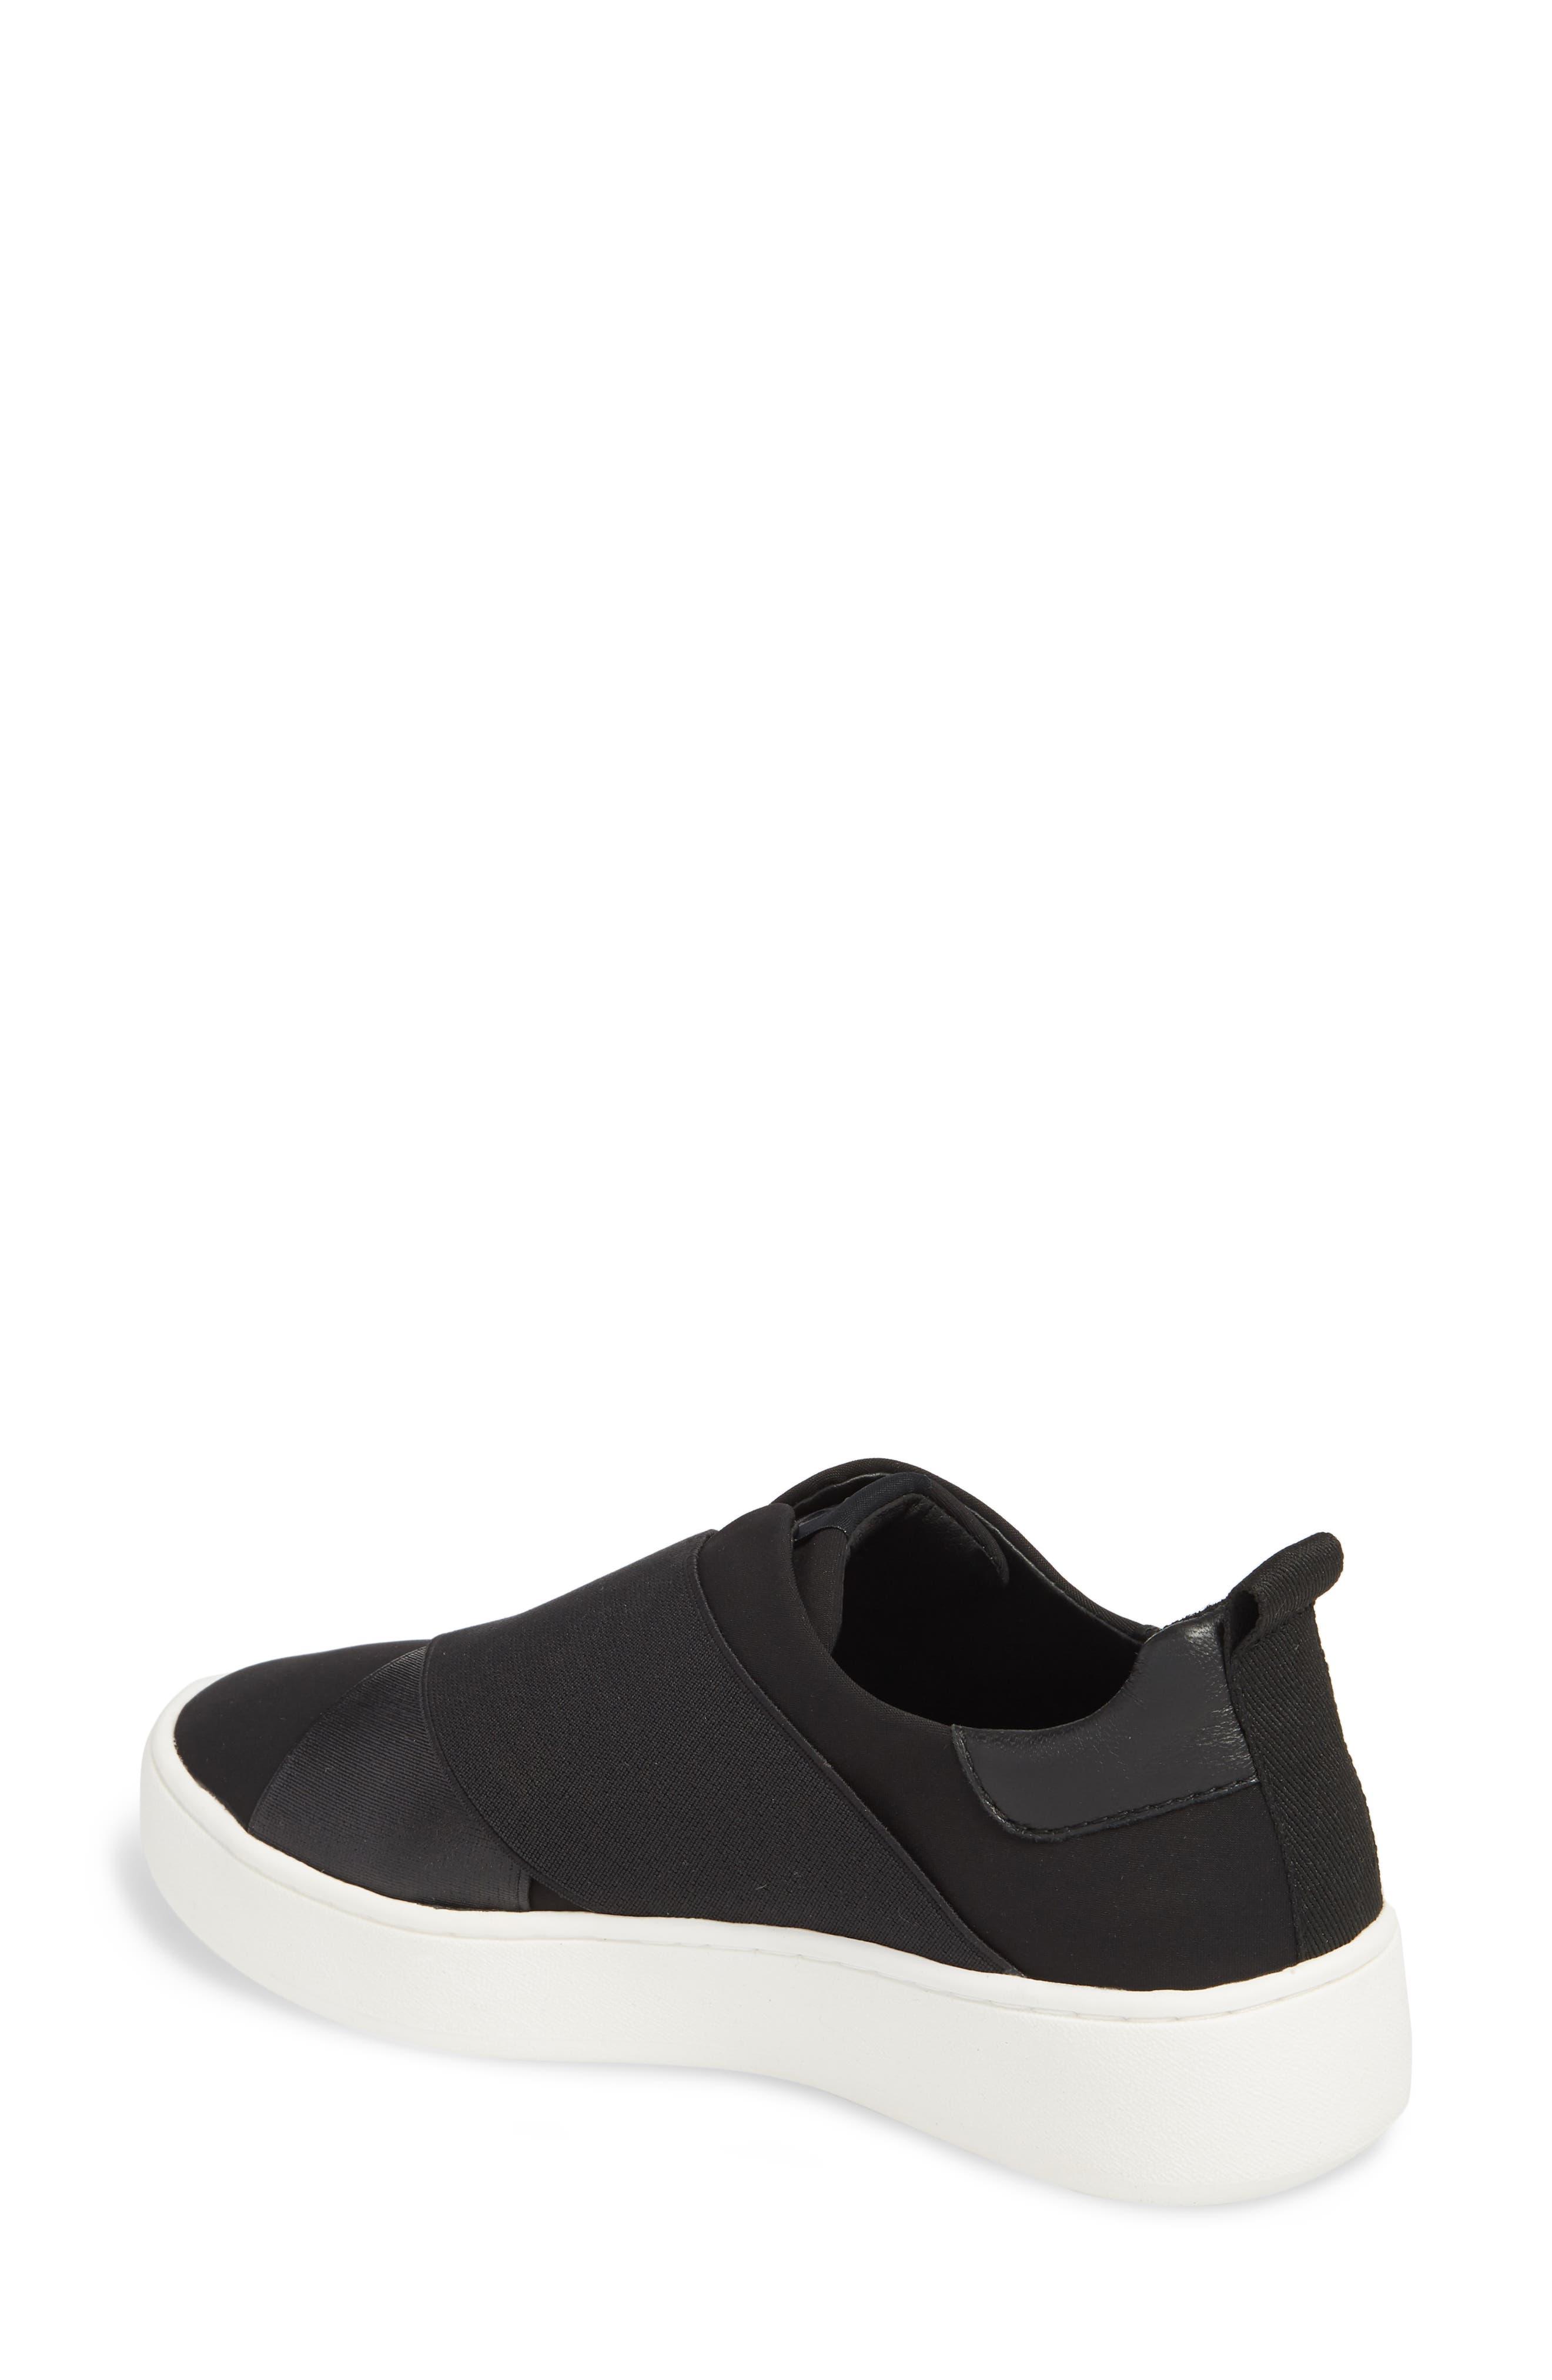 Coley Platform Slip-On Sneaker,                             Alternate thumbnail 2, color,                             BLACK LEATHER